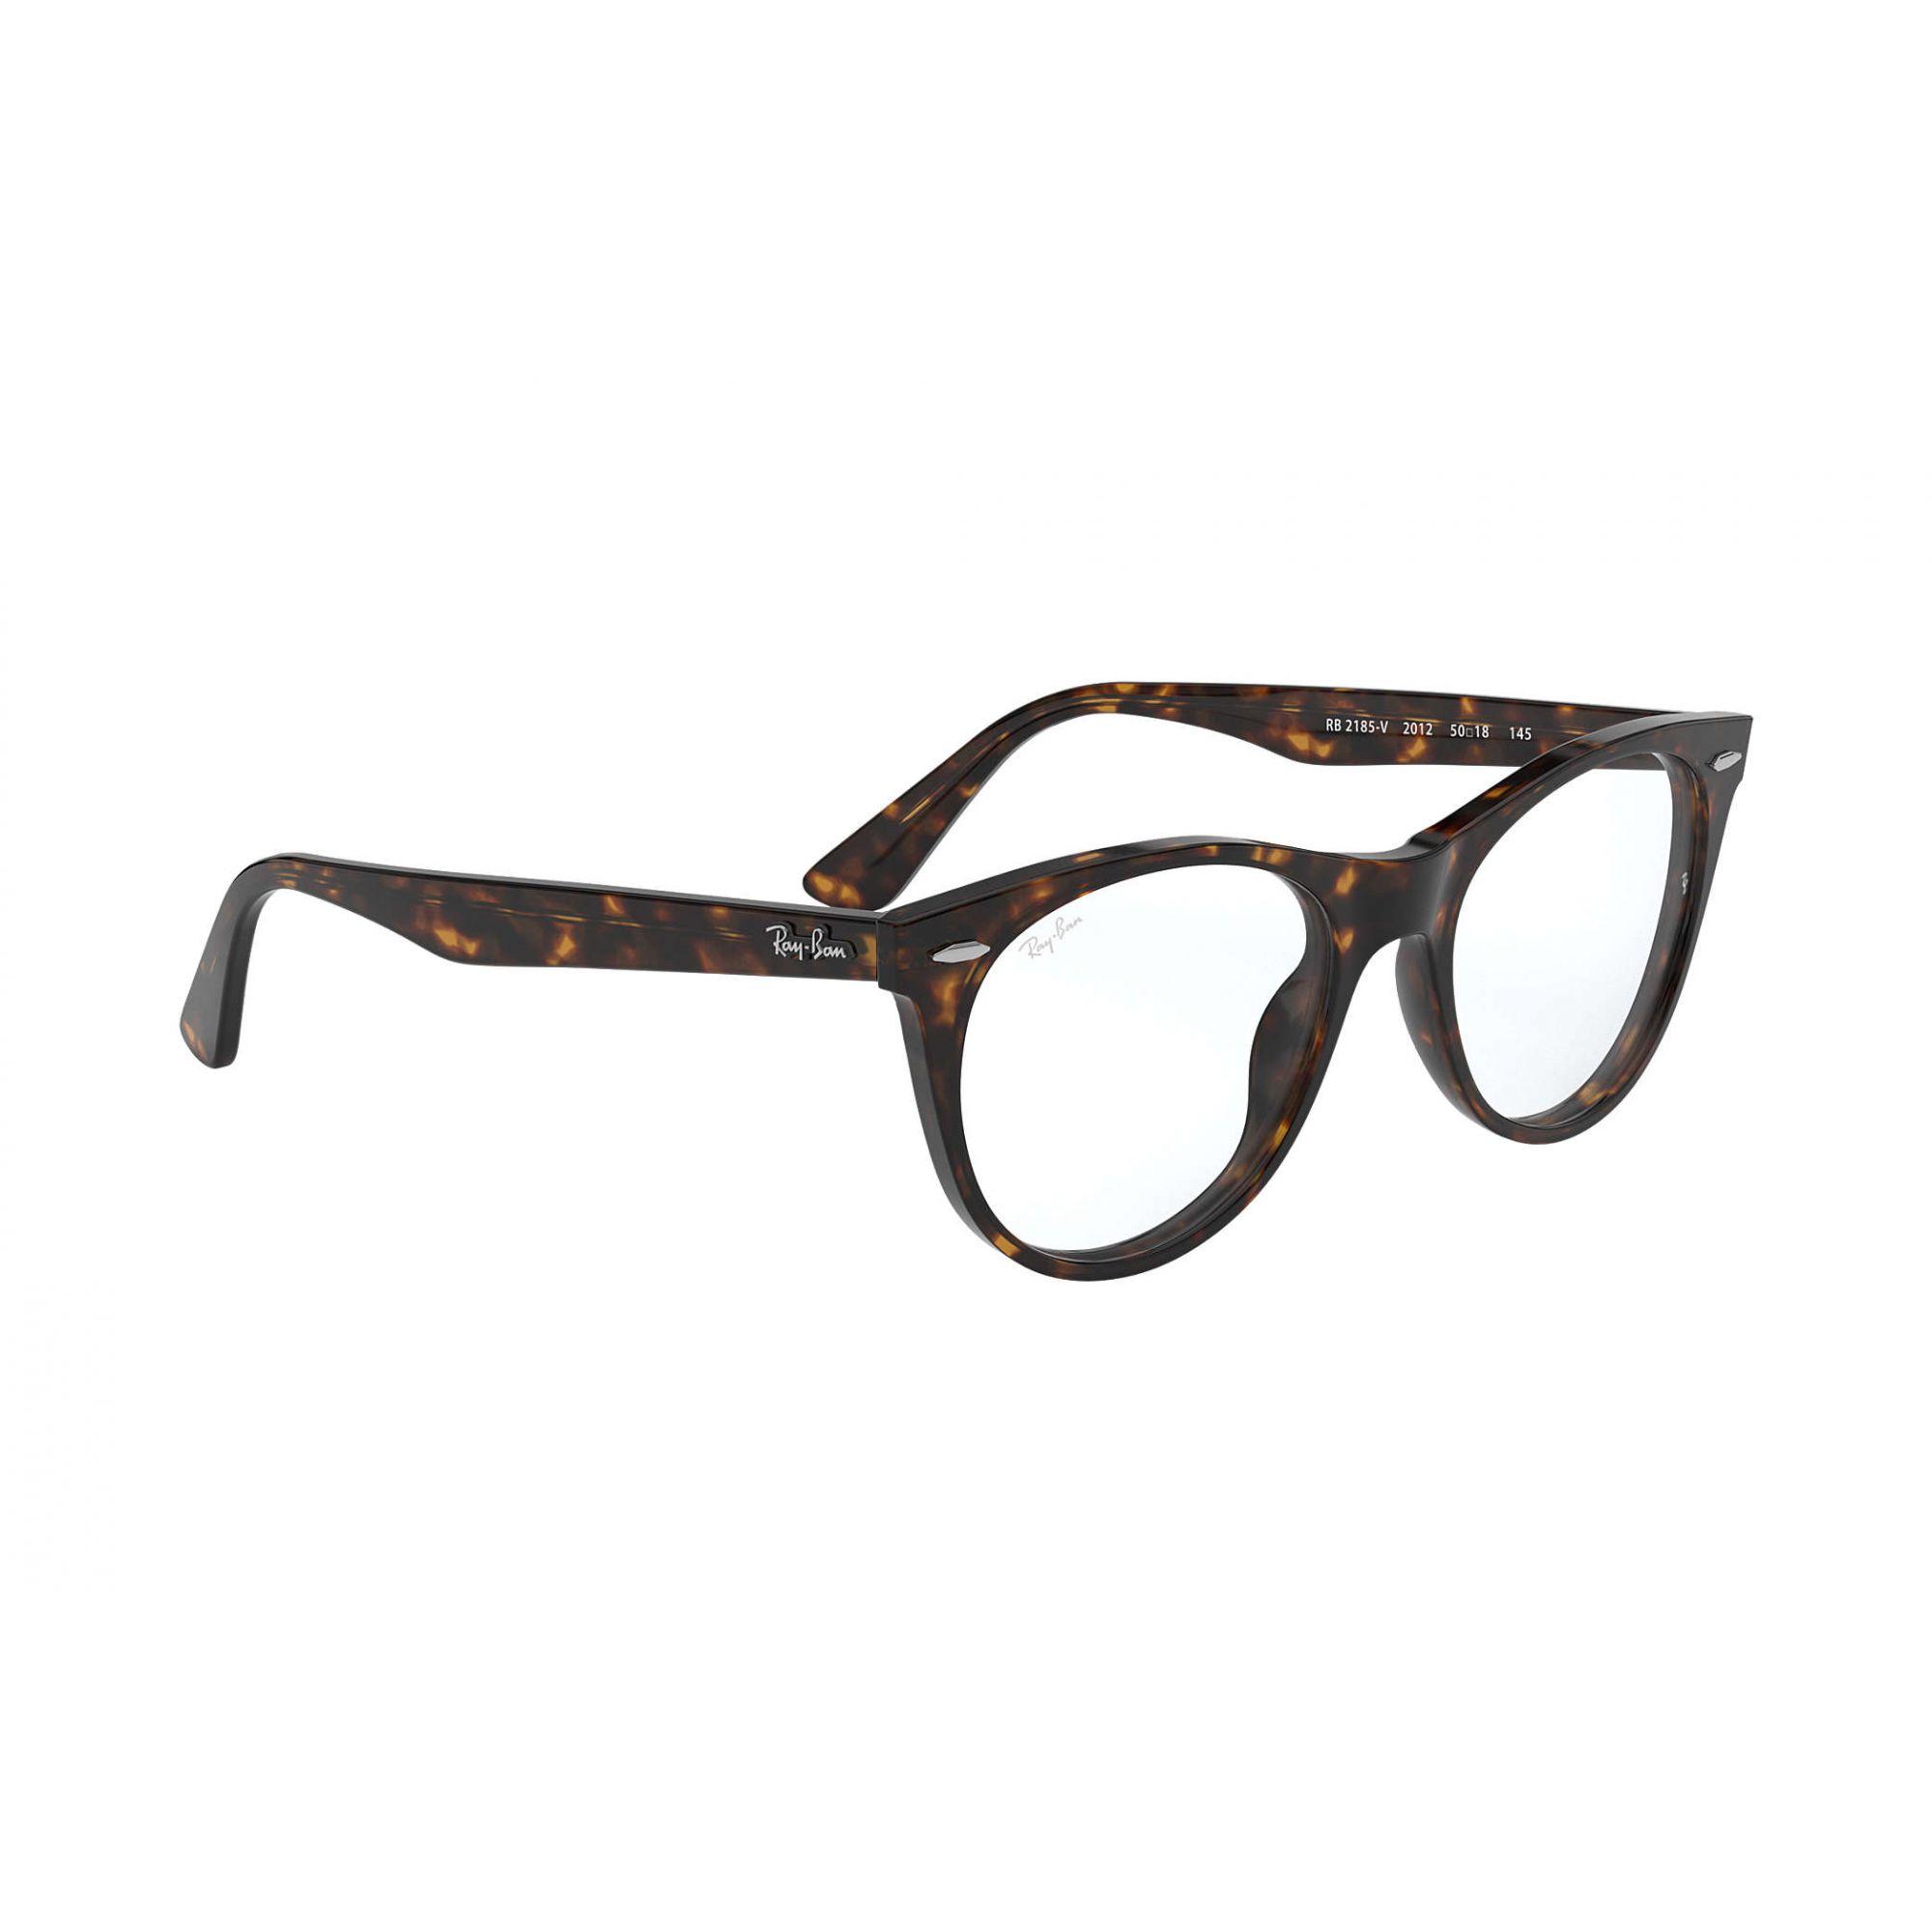 Ray Ban - RB2185V 2012 - Óculos de grau